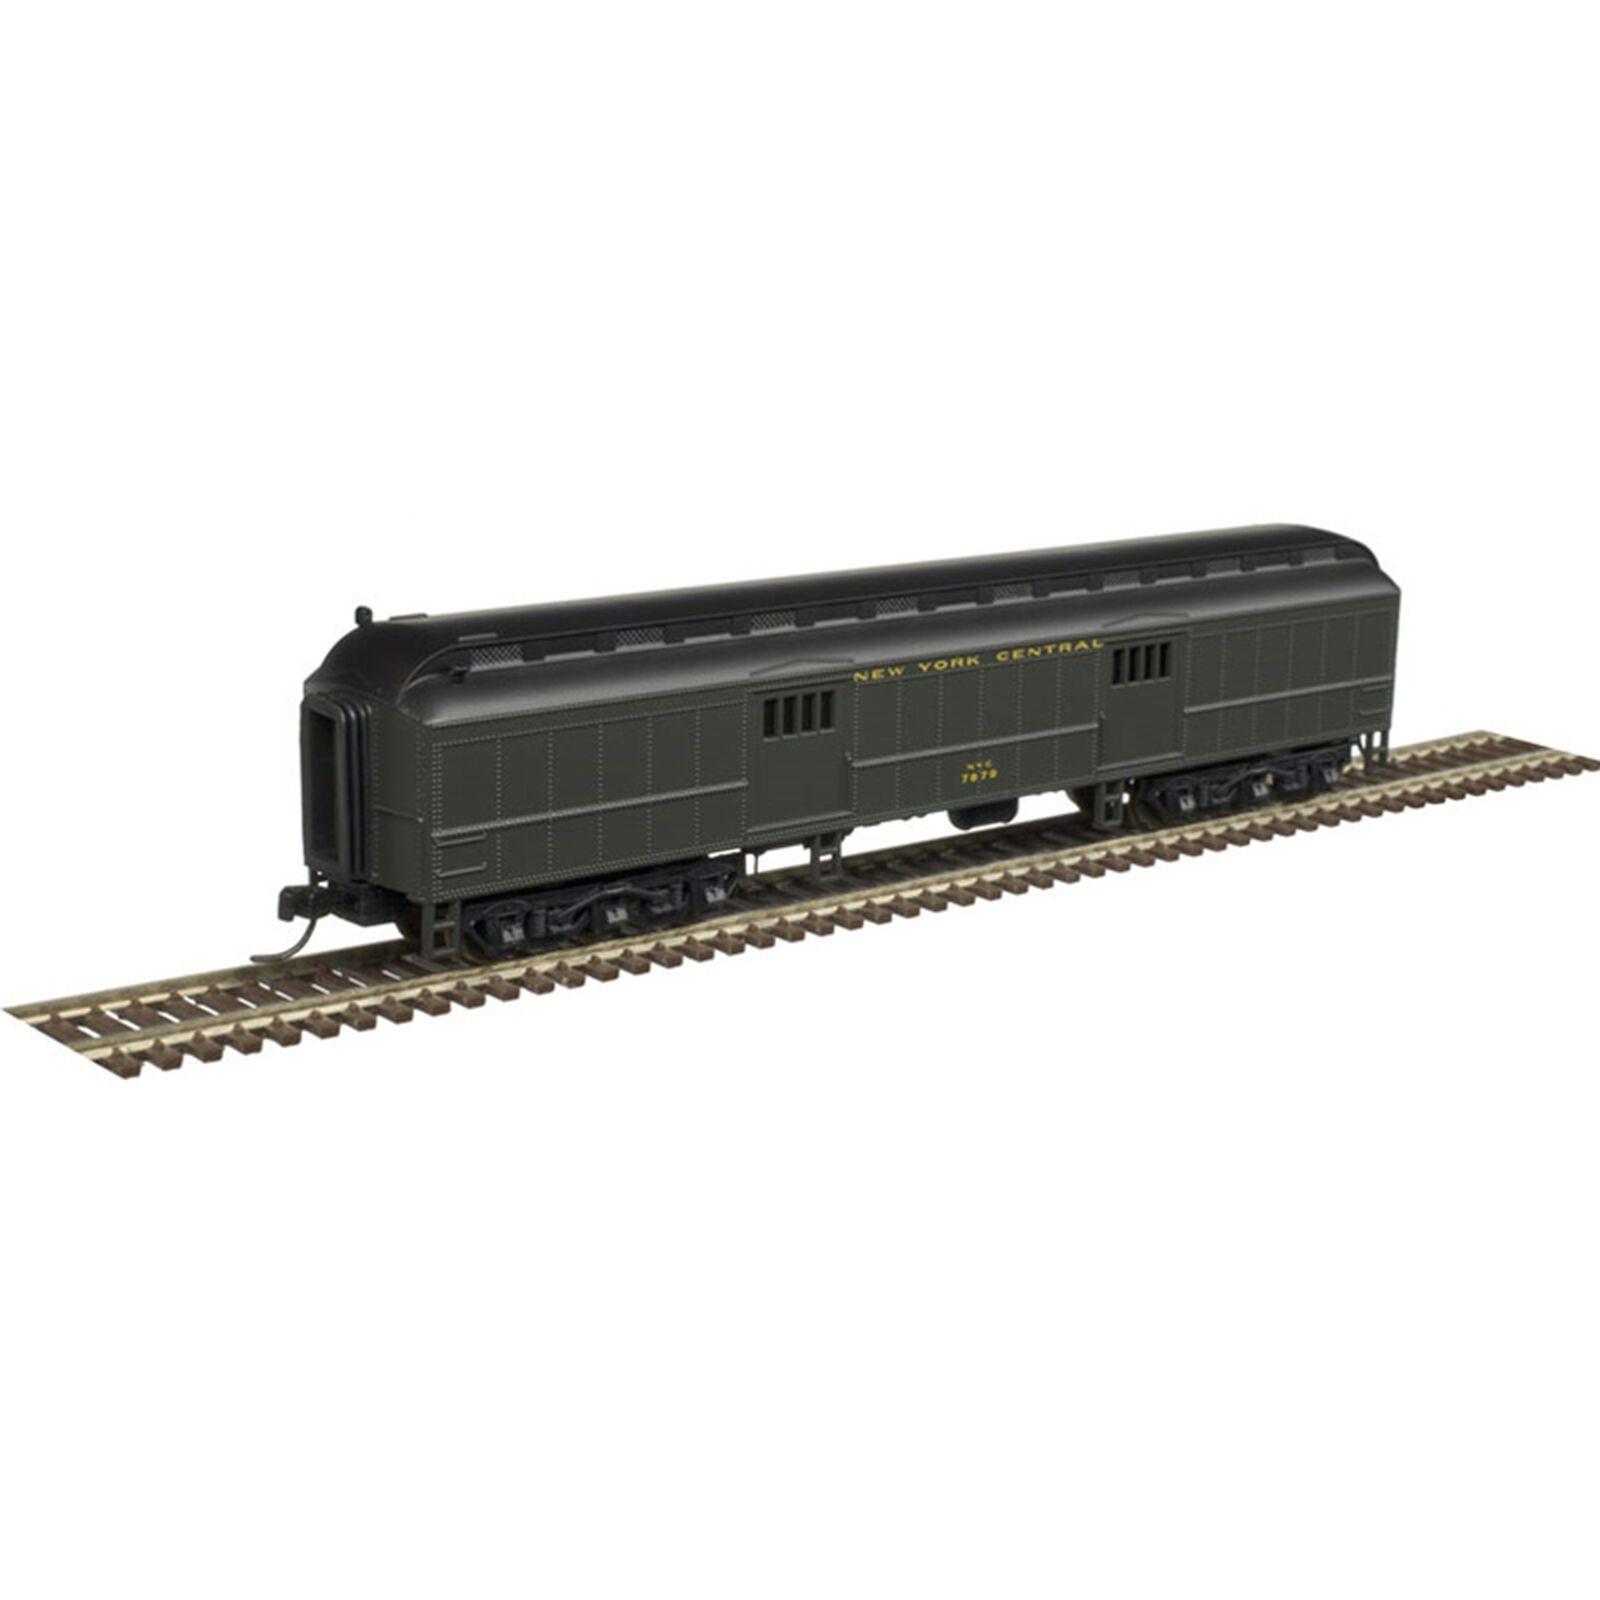 N Trainman 60' Baggage Car NYC #7959